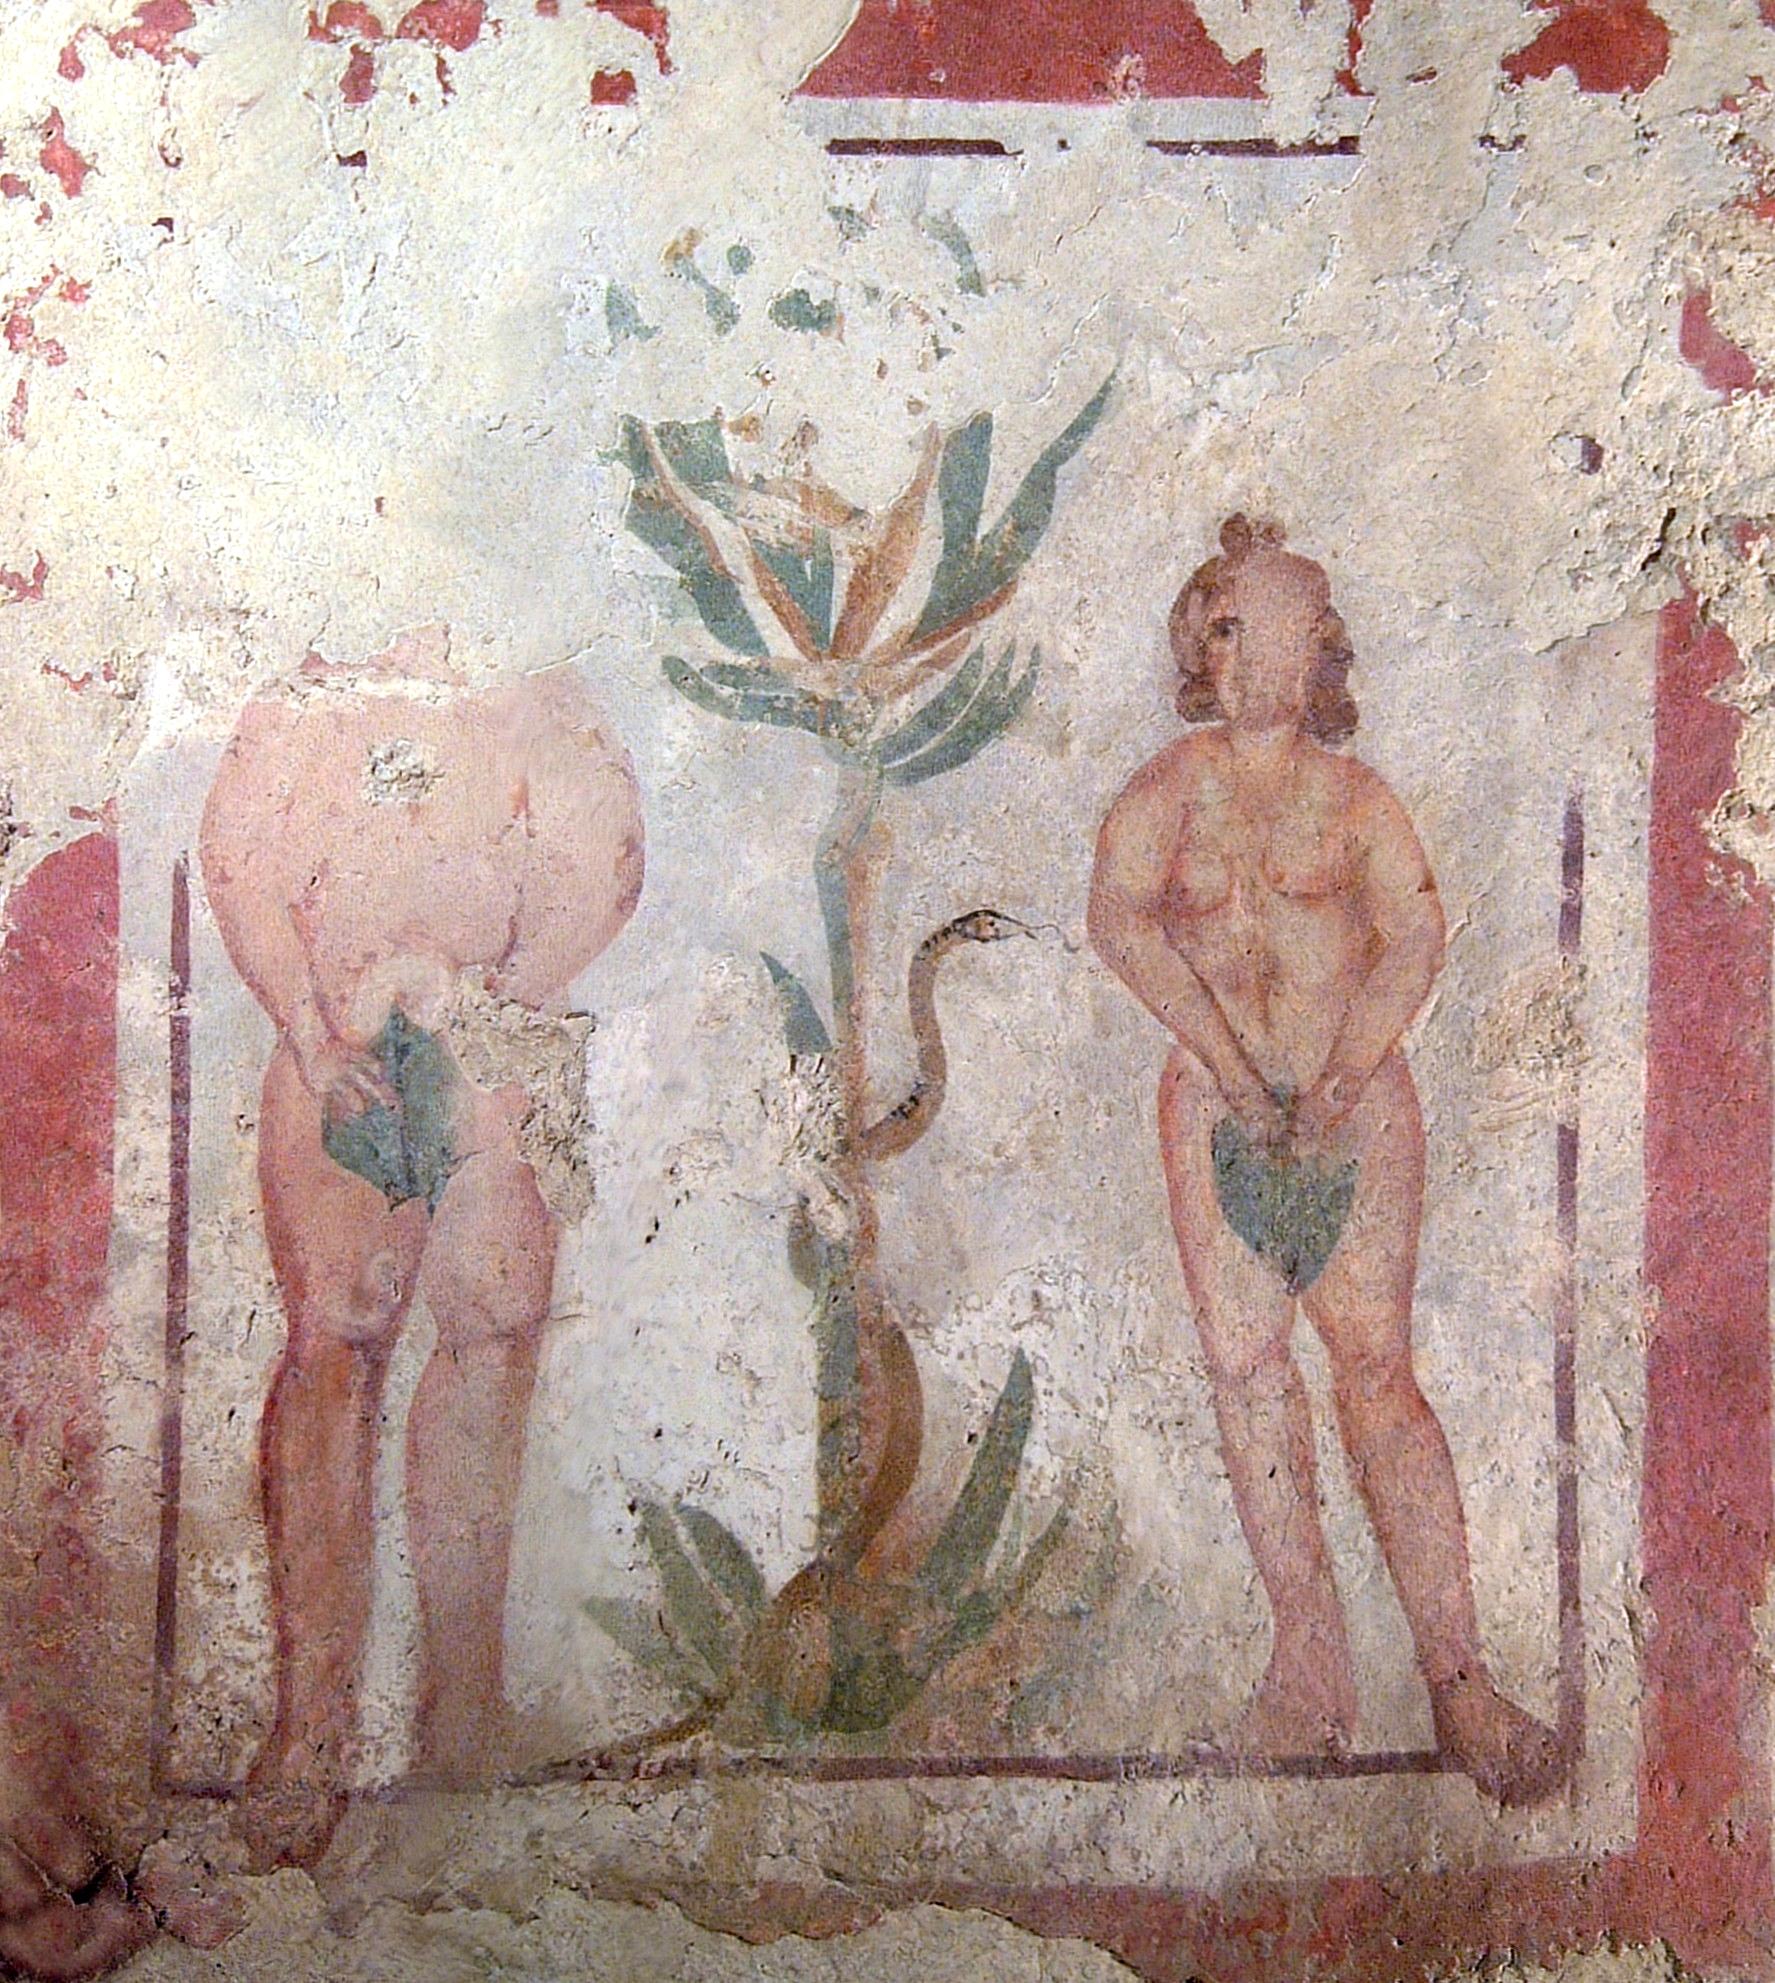 Adán y Eva, fresco de la Necrópolis de Pécs, siglo IV